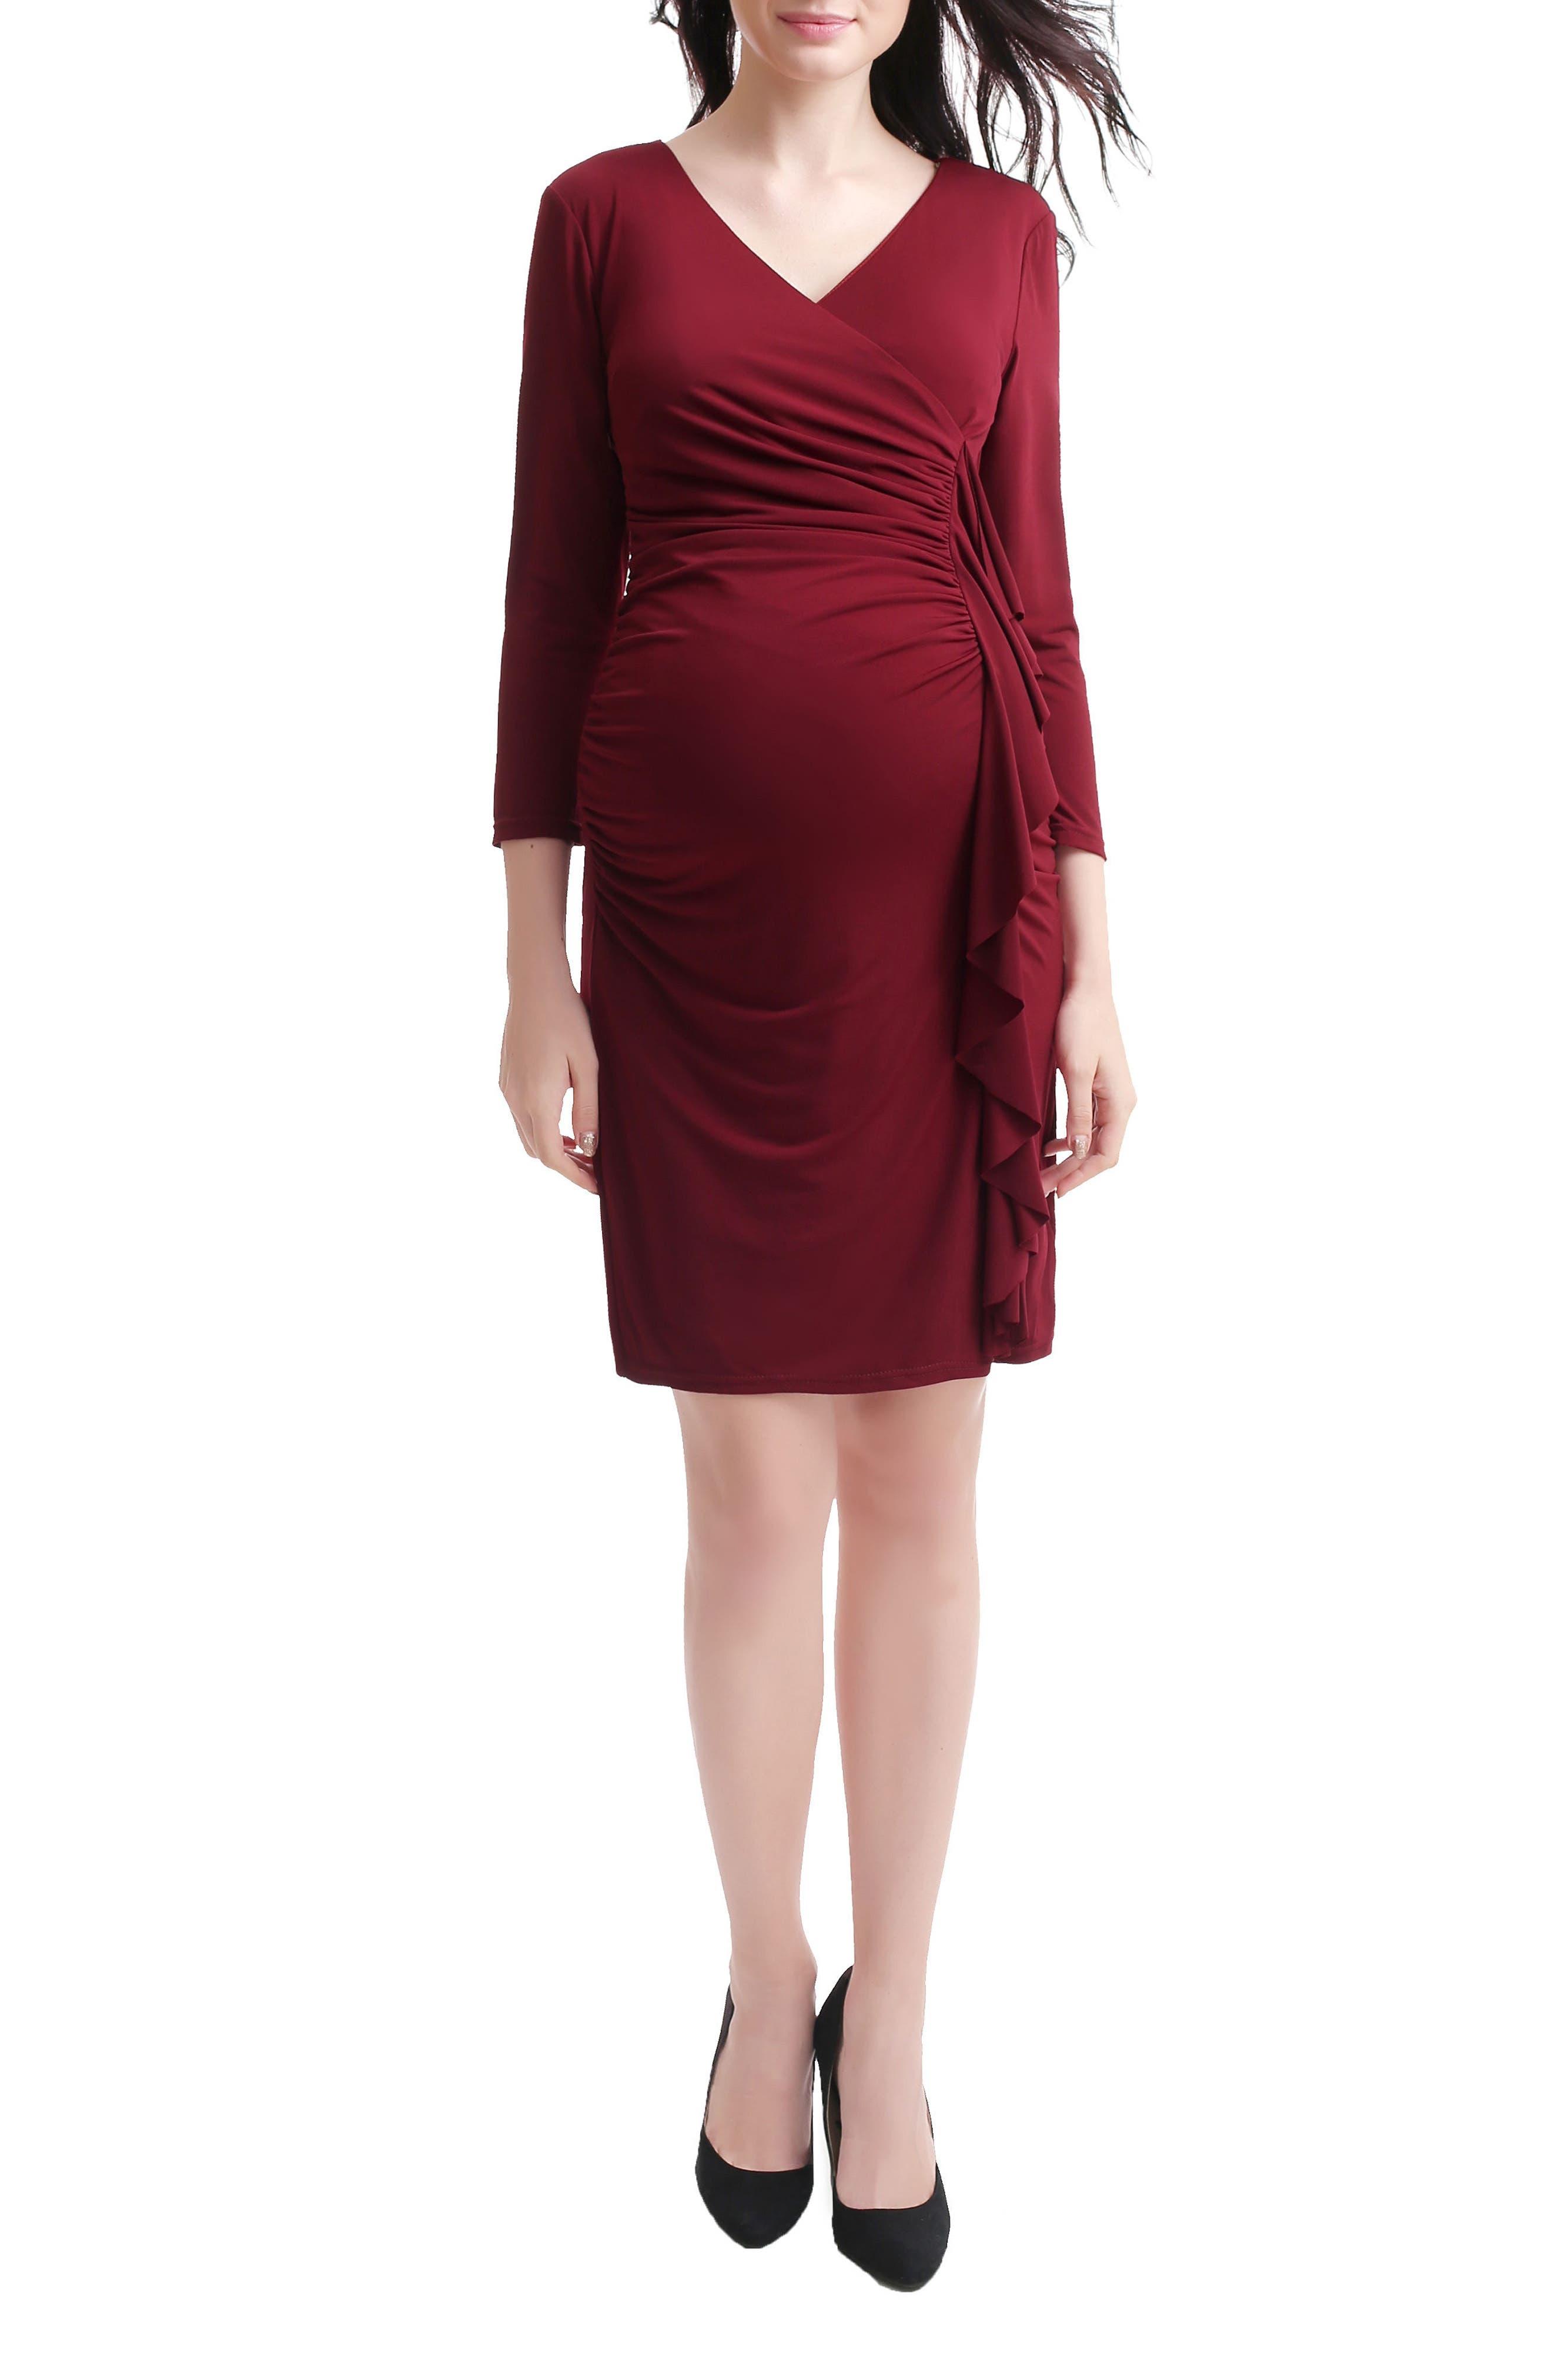 Gypsy Ruffle Maternity Dress,                             Alternate thumbnail 4, color,